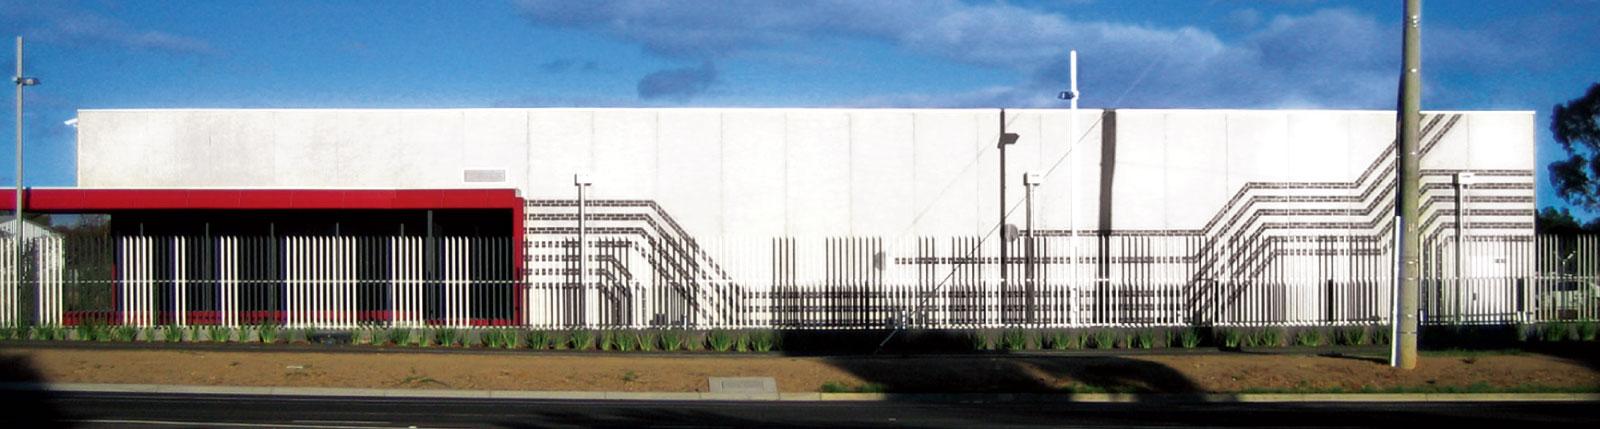 H2o Architects Melbourne-Bendigo Bank Regional Info Repository-03